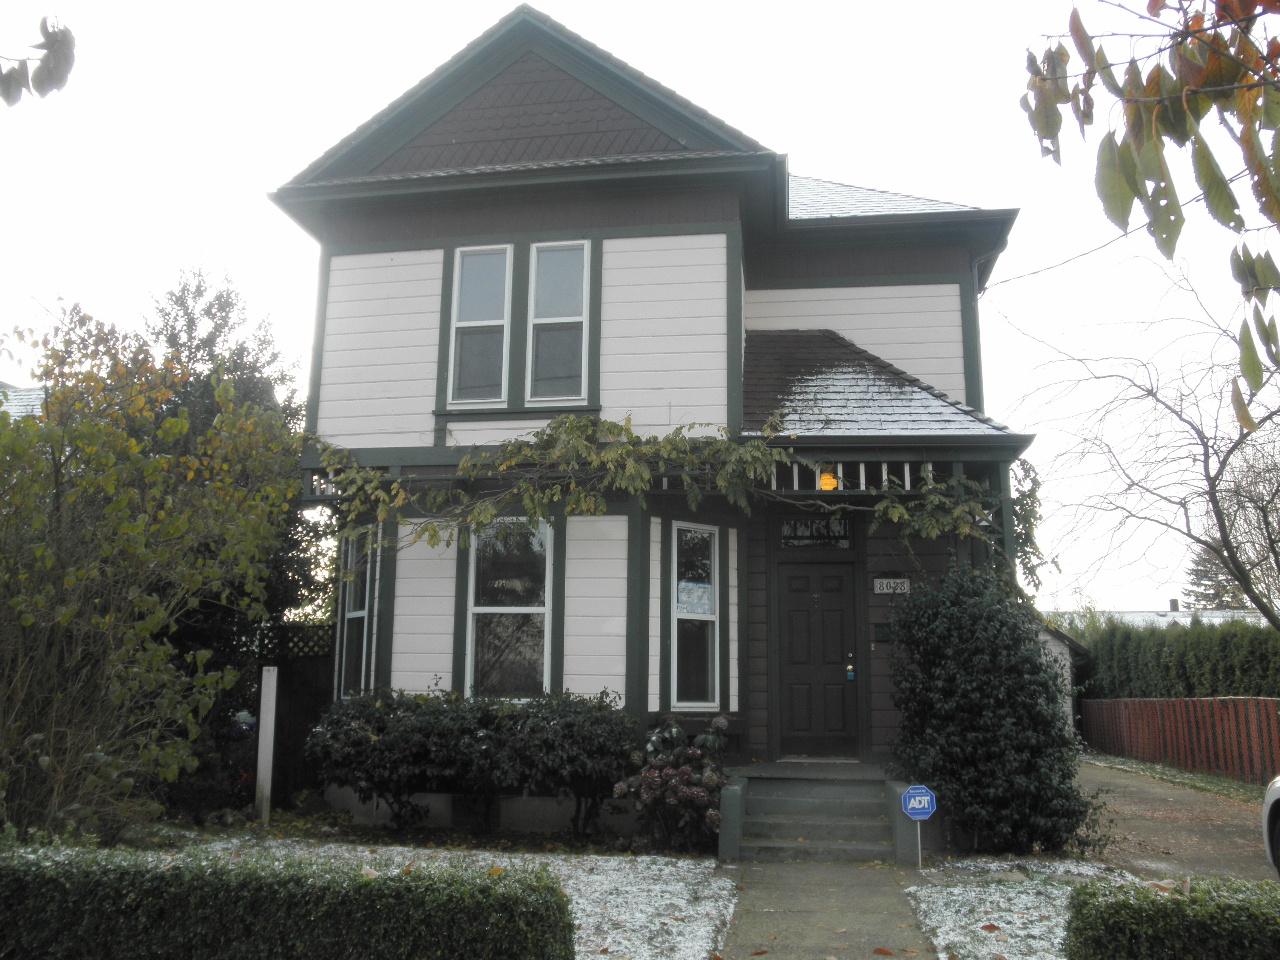 Portland, OR 97213 Cheap Houses for Sale | Portland ...